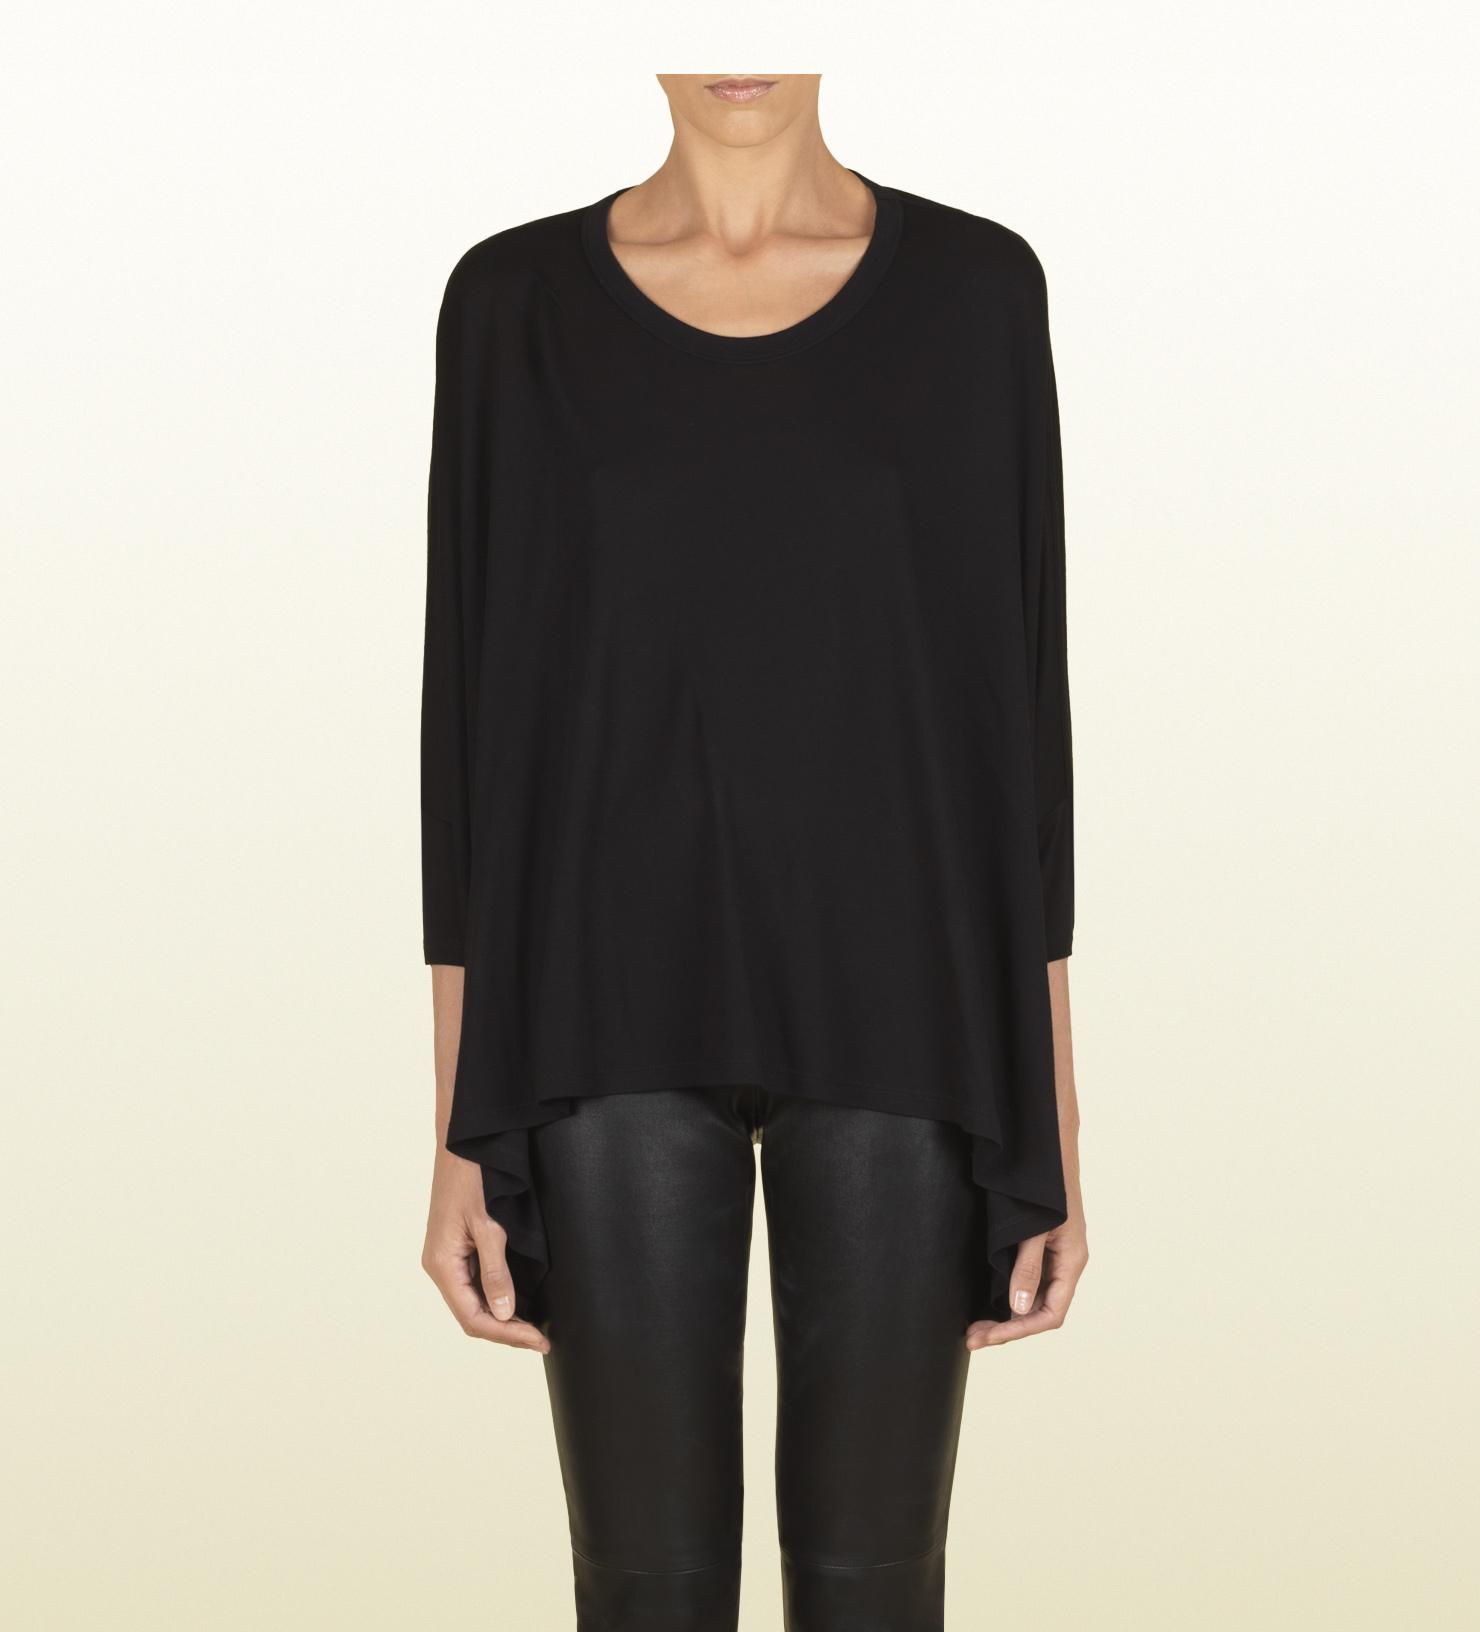 48b438cd Womens Gucci T Shirt Black | The Art of Mike Mignola